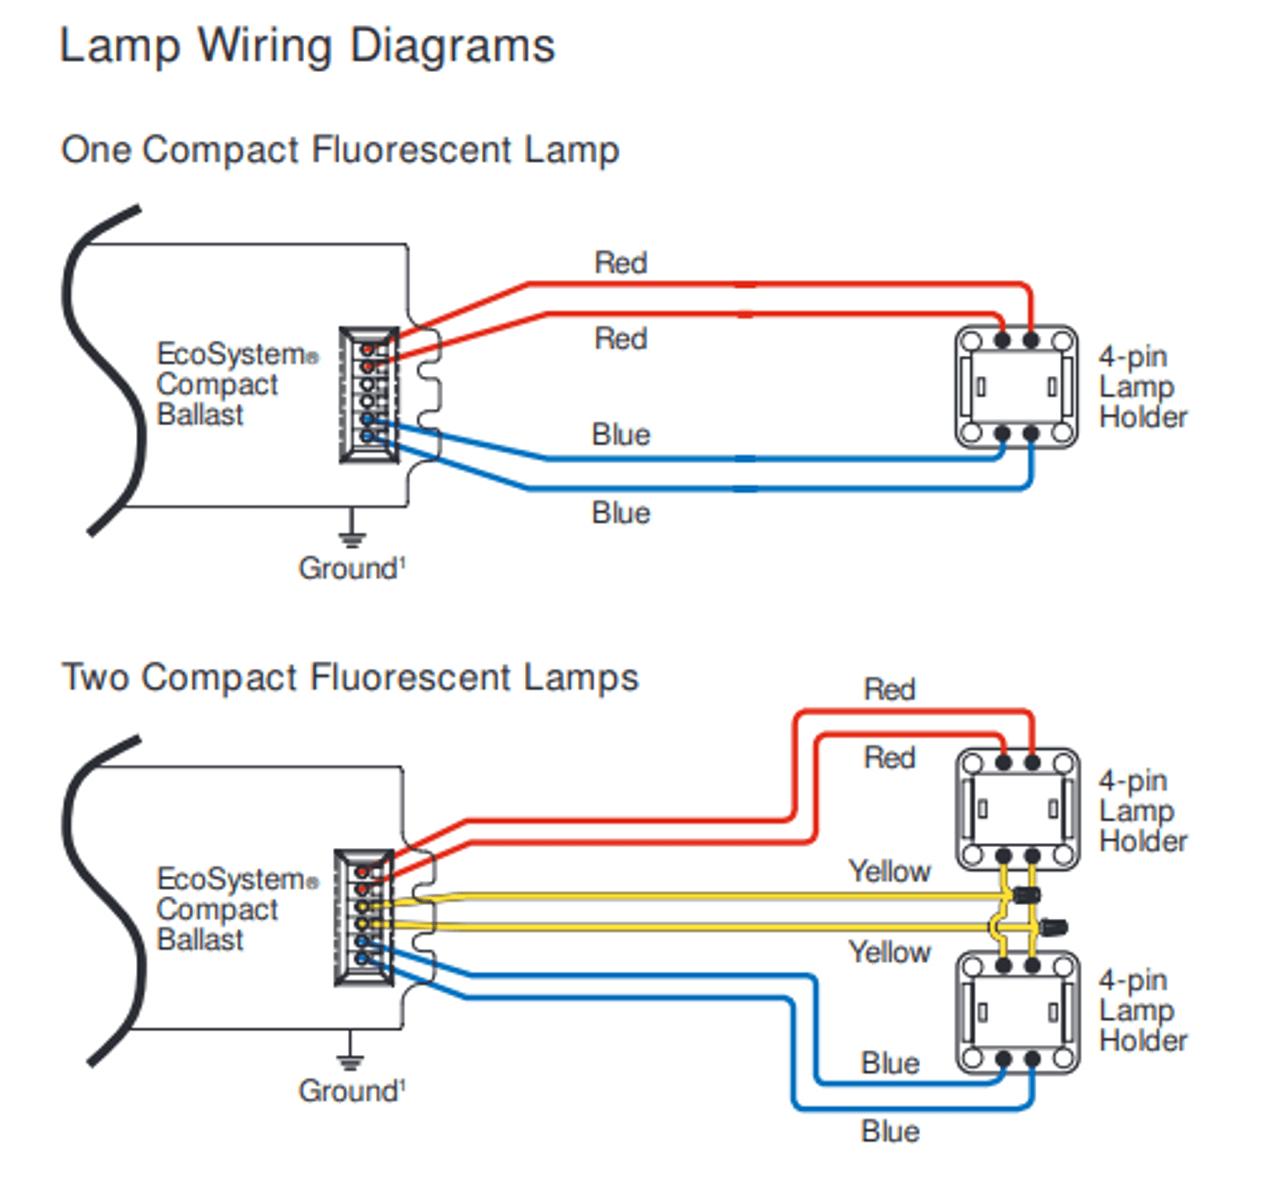 ec3dt4mwku1s lutron electronic fluorescent dimming ballastec3dt4mwku1s lutron ec3dt4mwku1s dimensions ec3dt4mwku1s wiring diagram [ 1280 x 1184 Pixel ]